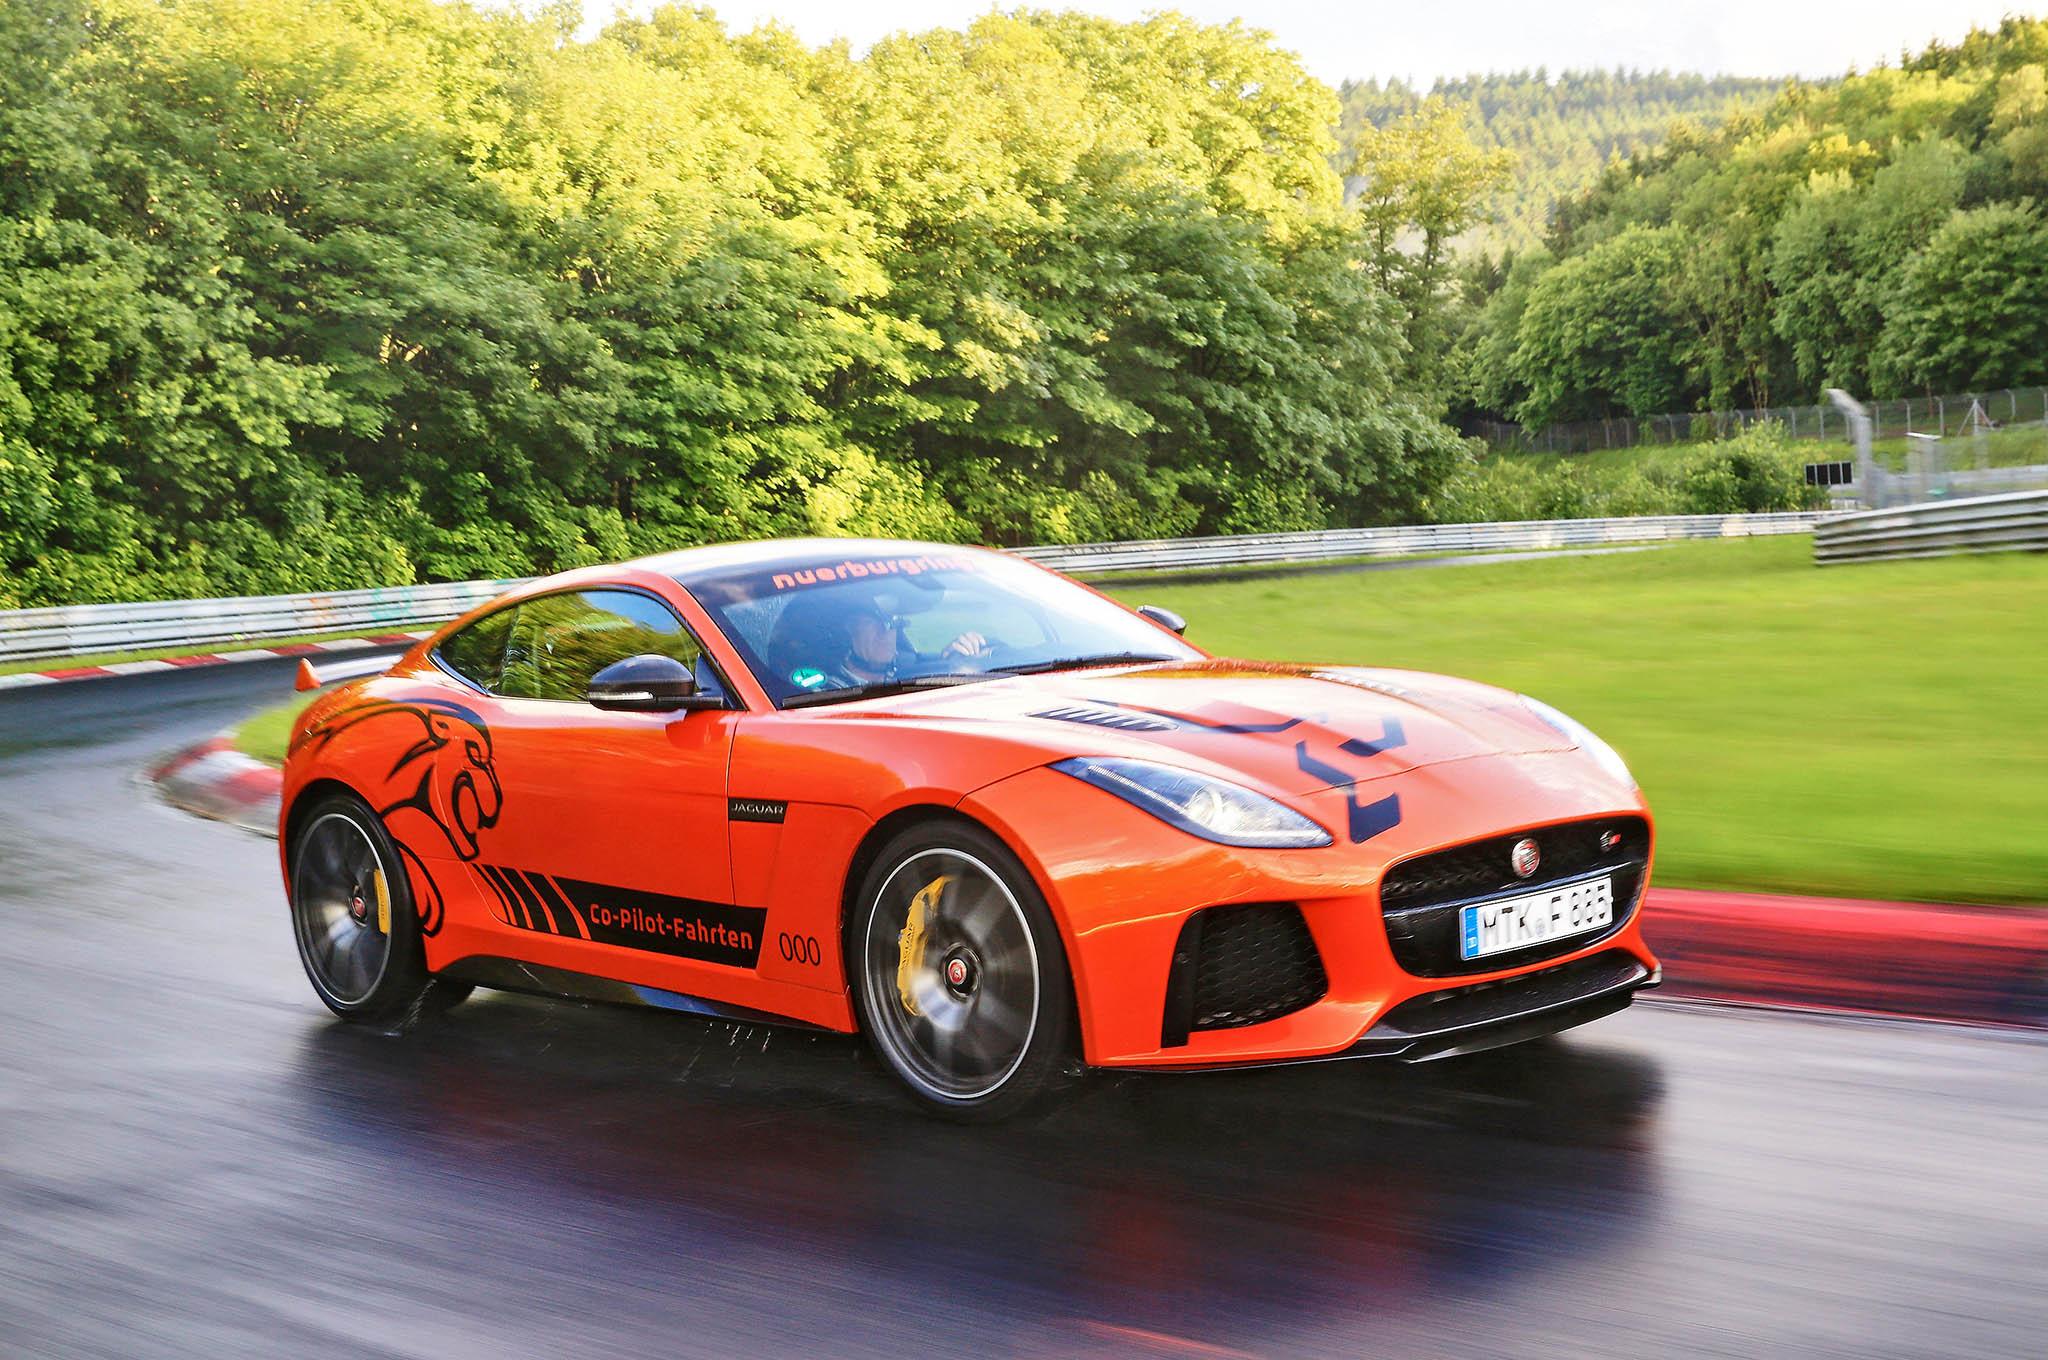 jaguar svr ring nurburgring take cat rent adopt around verleiding meerijden ultieme engined layout could mid ftype galerie gen fastest